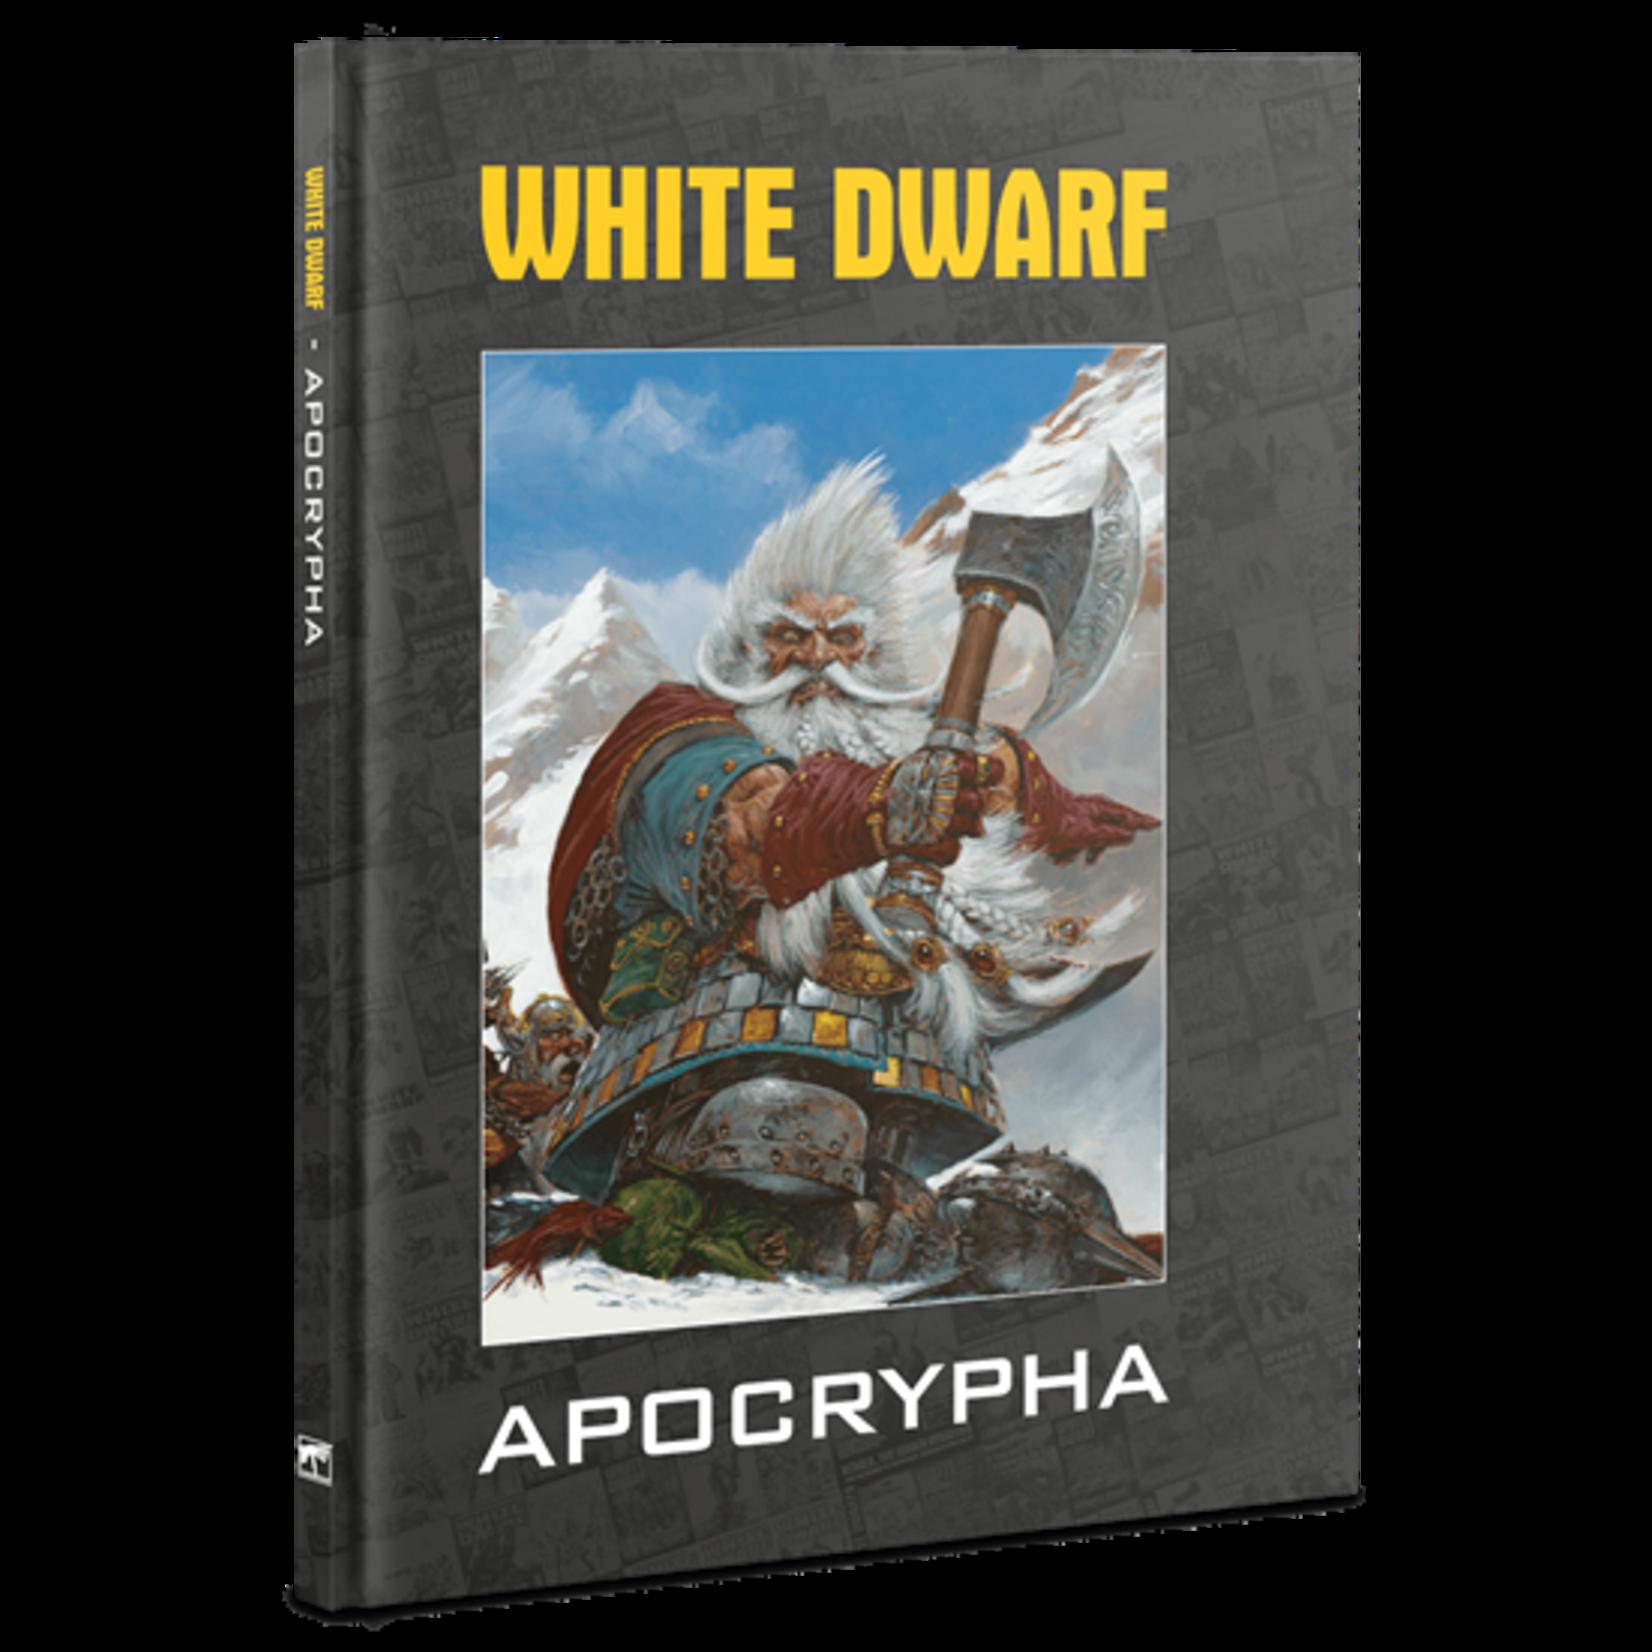 Apocrypha (White Dwarf)